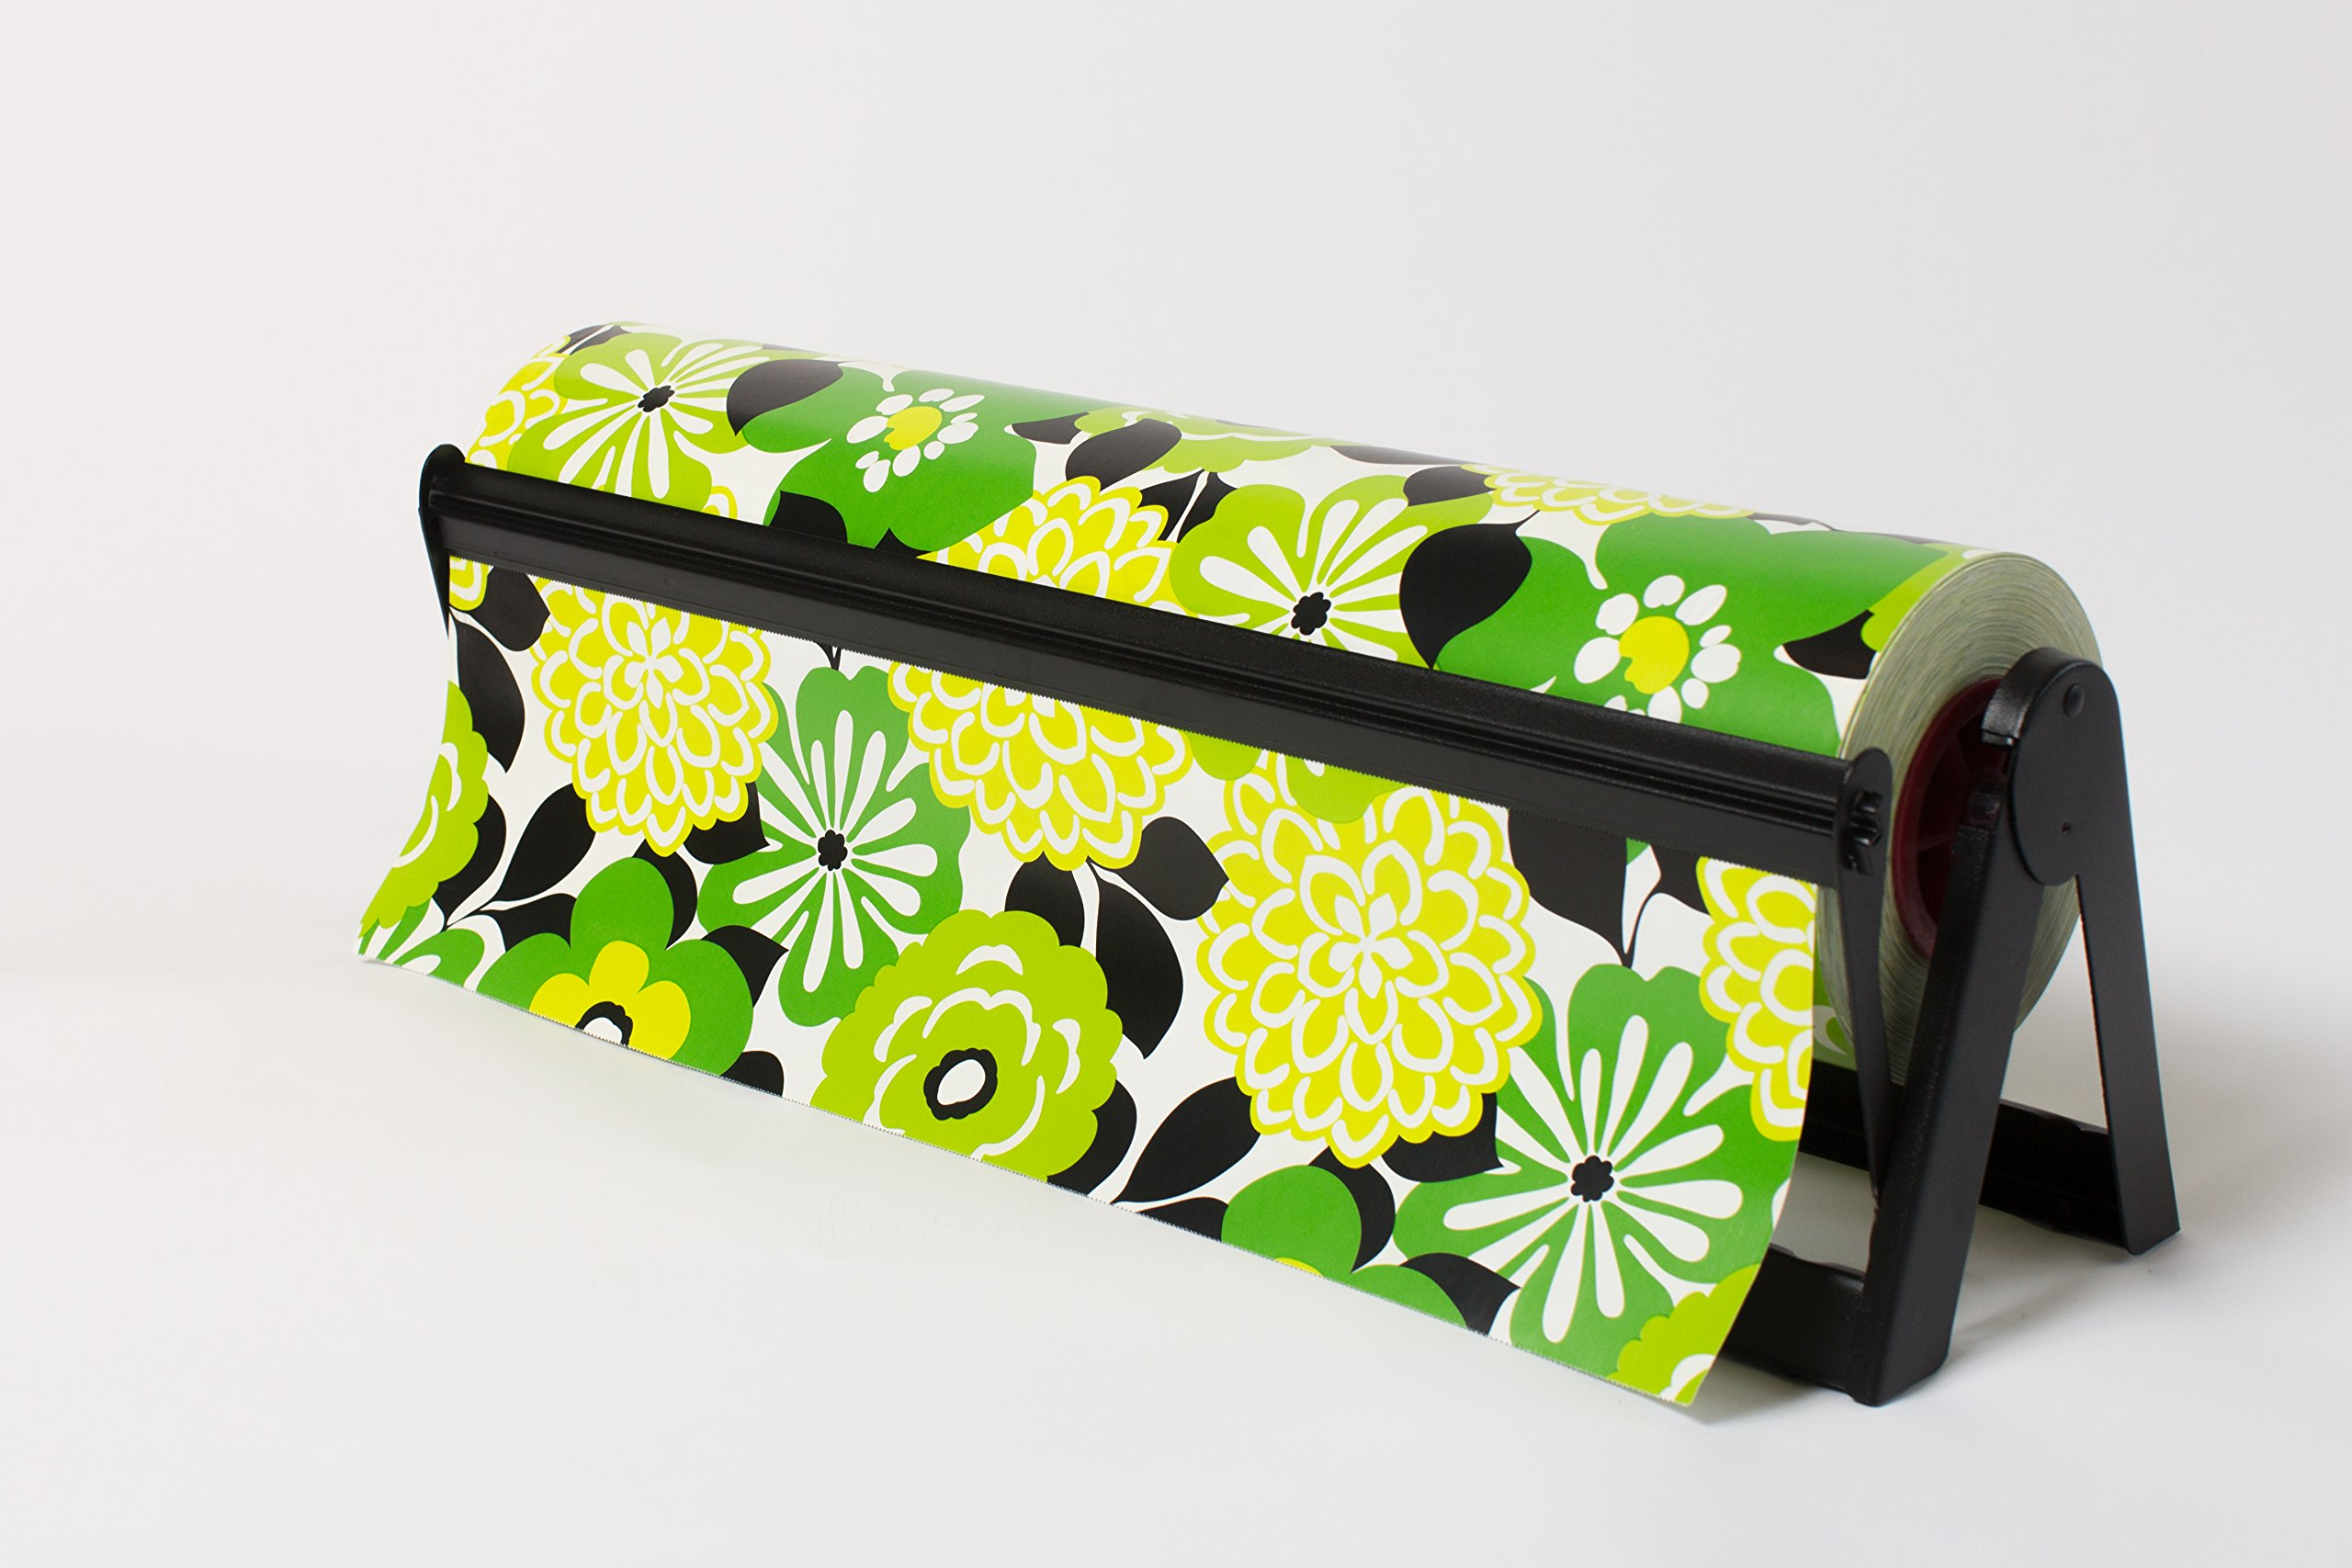 24'' Matte Black - All In One Paper Roll Dispenser (2 Dispensers) - Bulman-A500-24MB